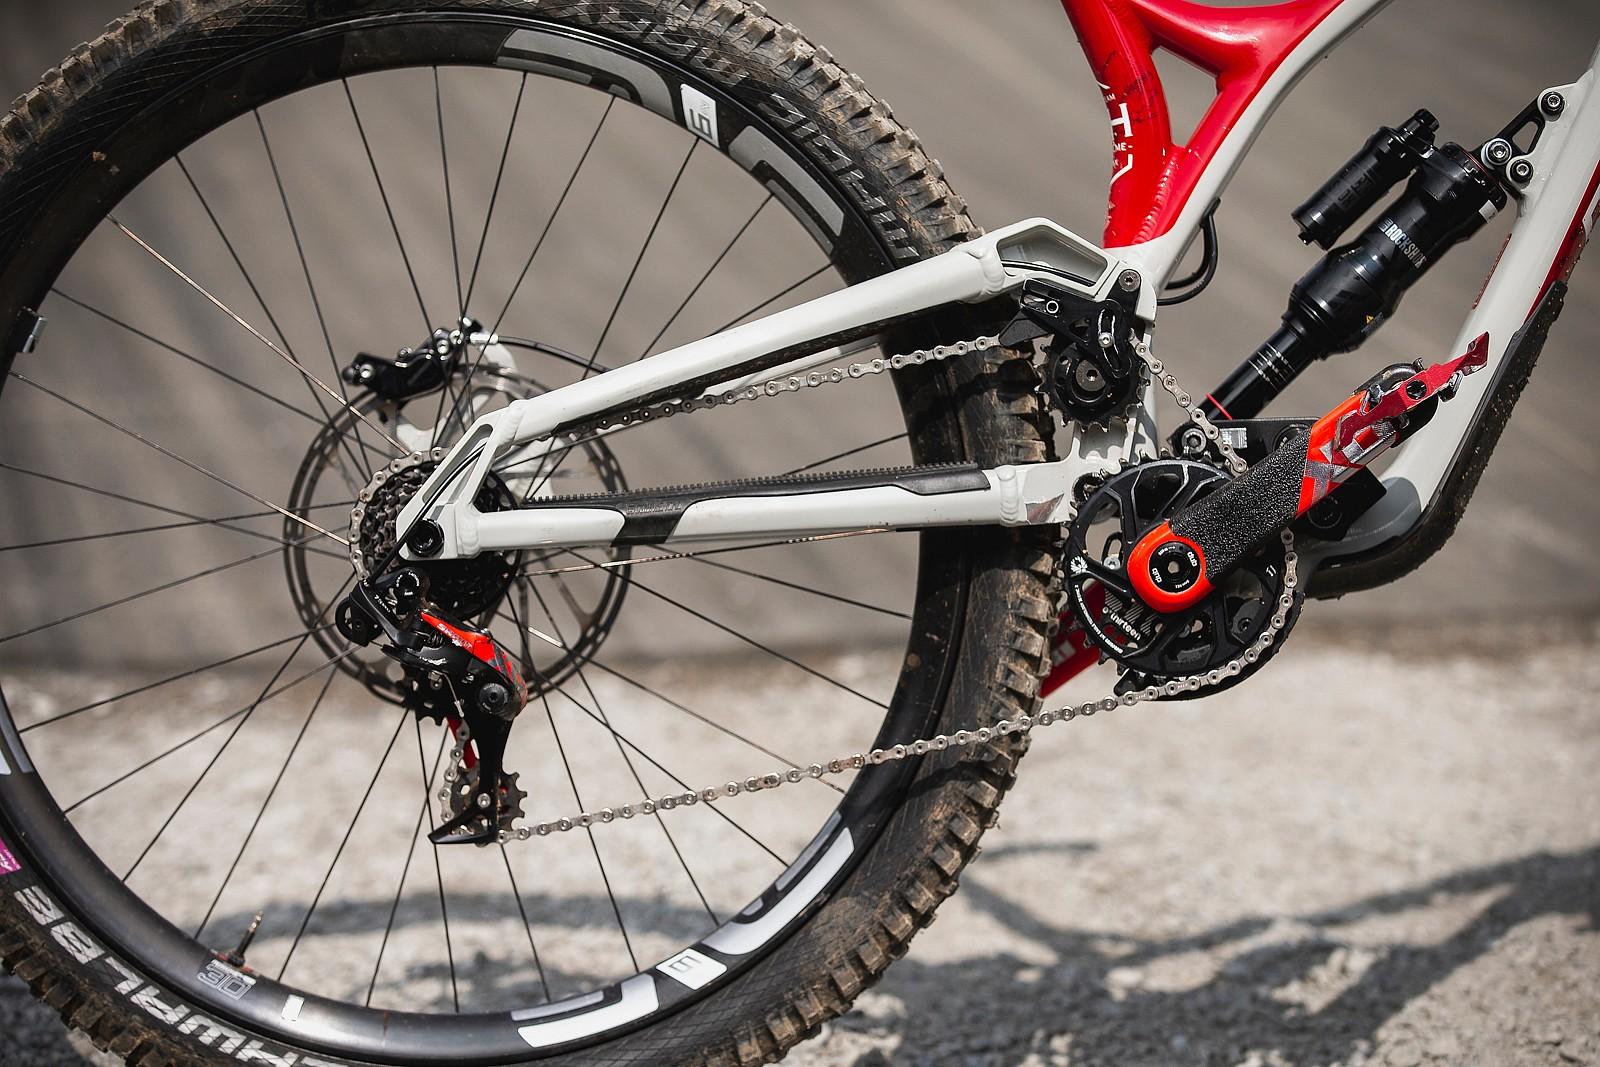 Rear End - WINNING BIKE - Amaury Pierron's Commencal Supreme DH - Mountain Biking Pictures - Vital MTB